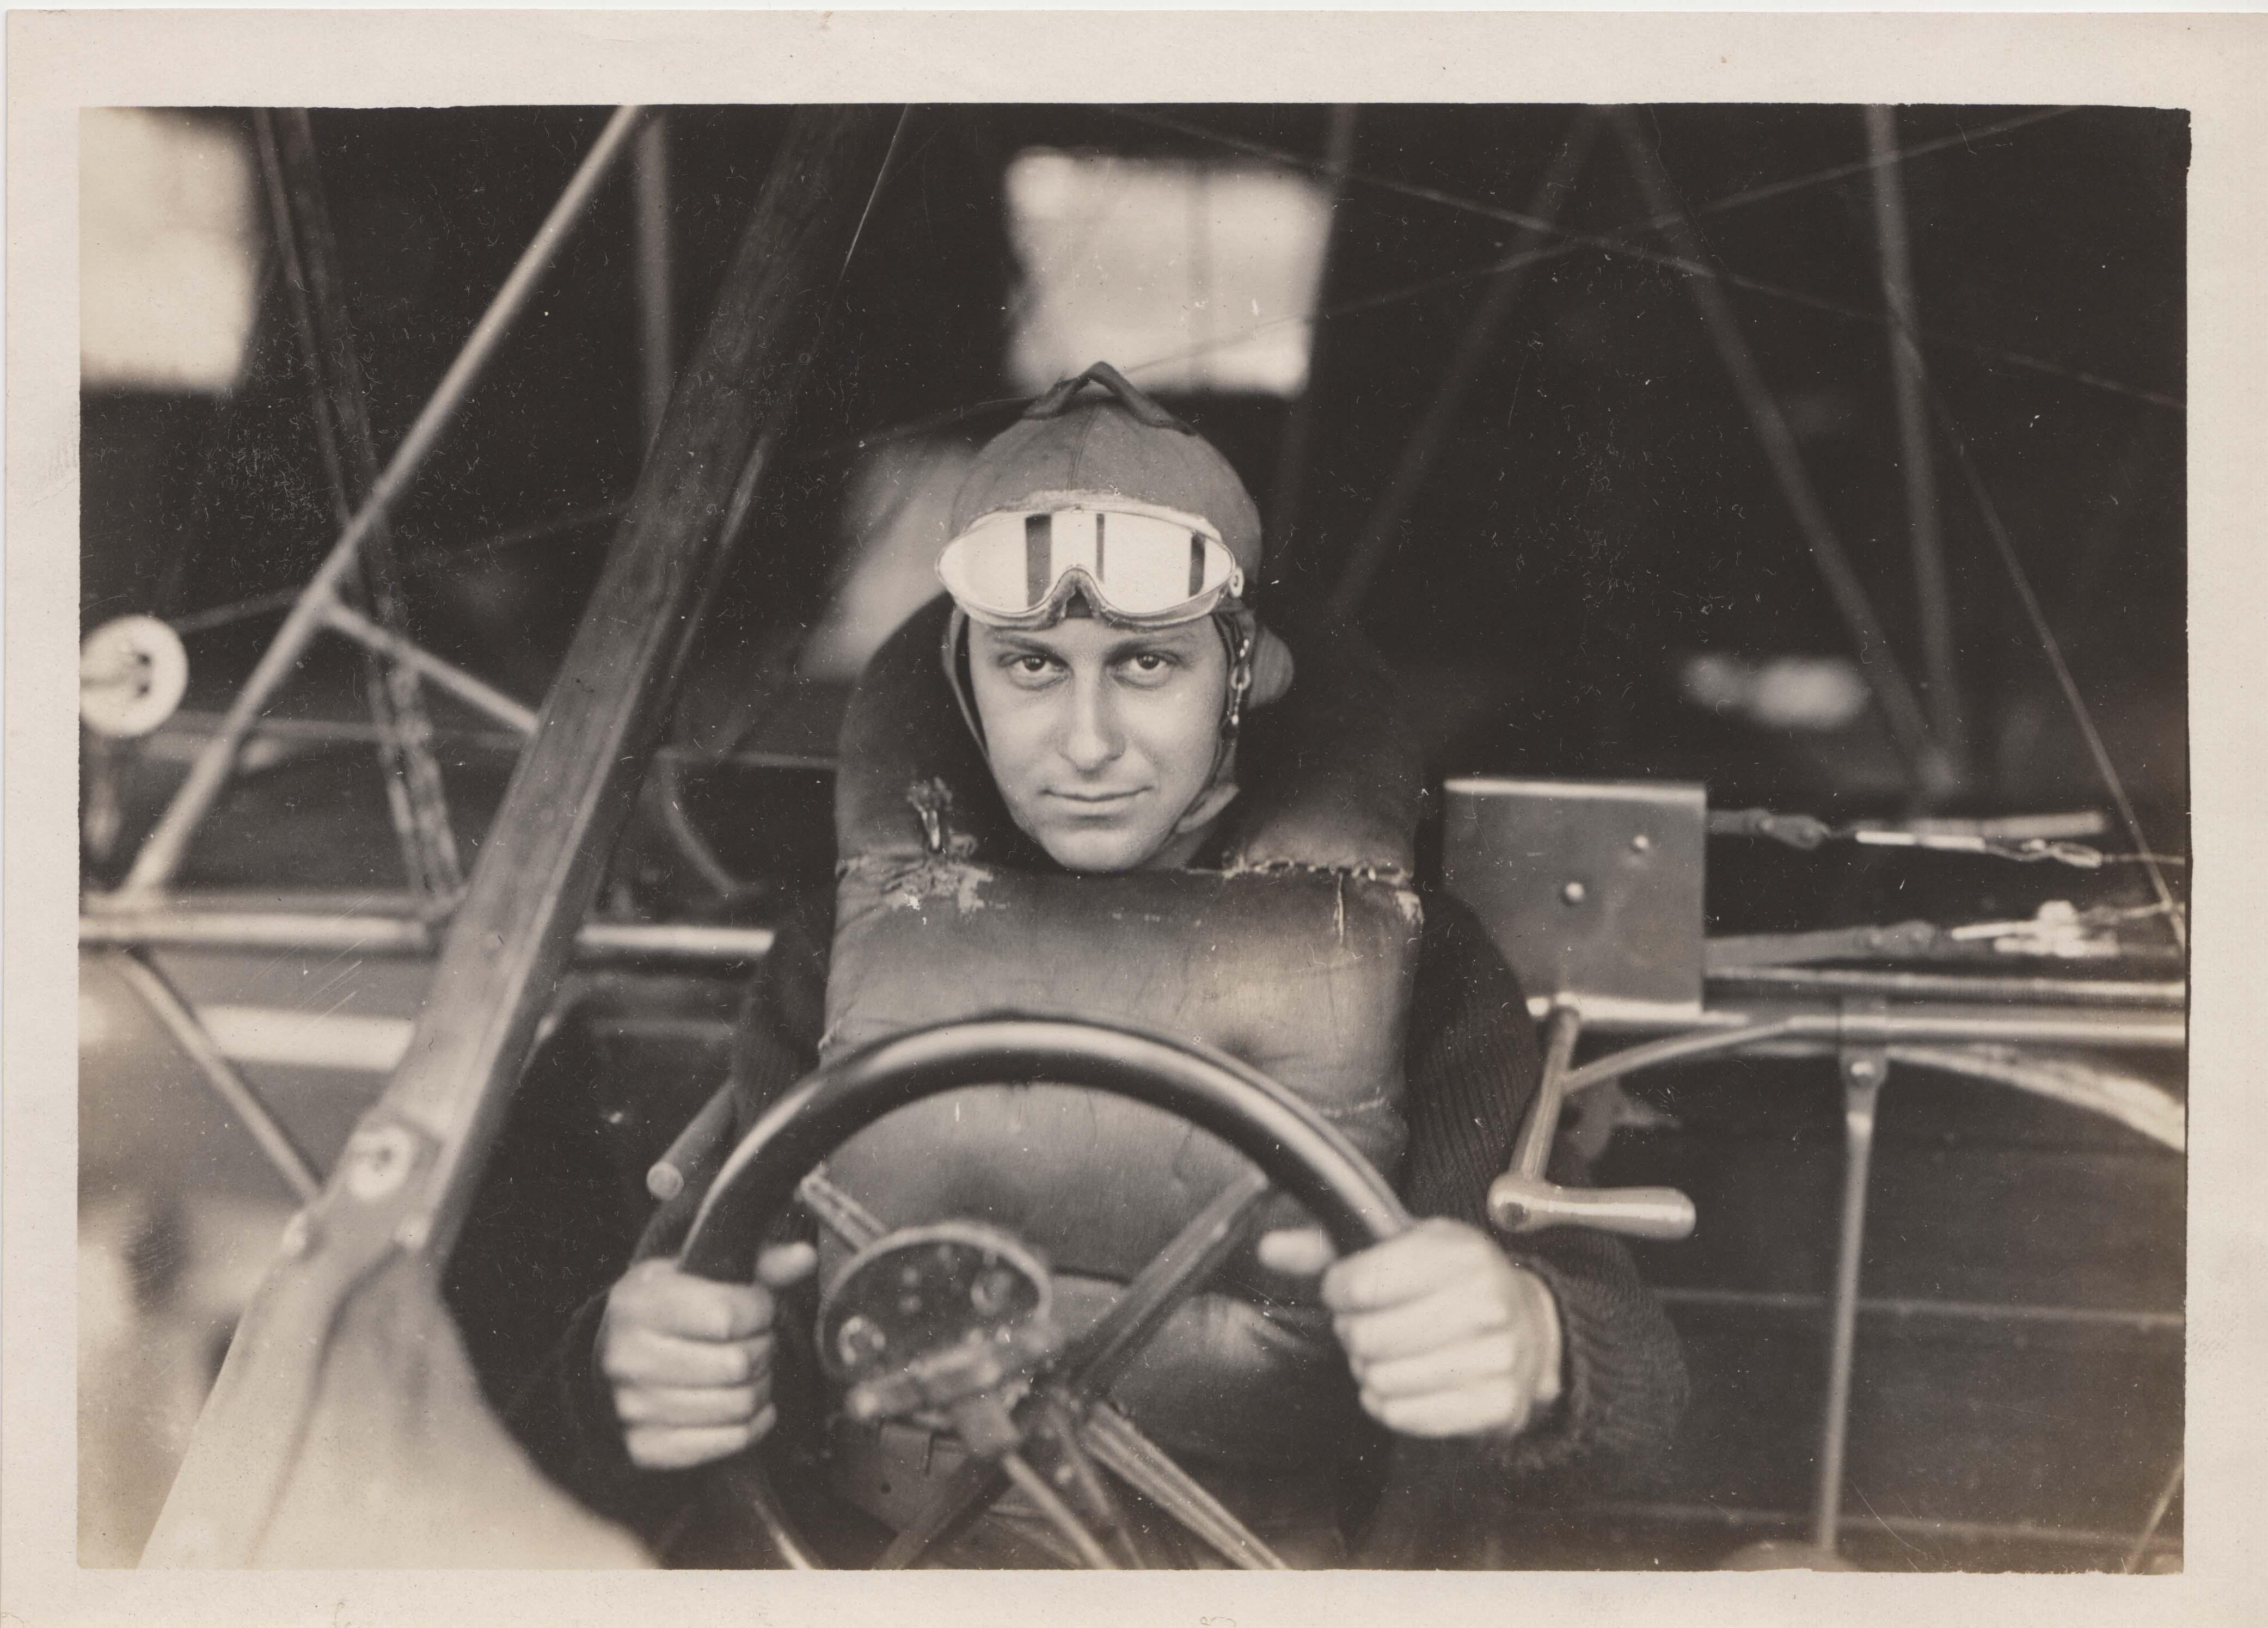 0223 A pilot in cockpit